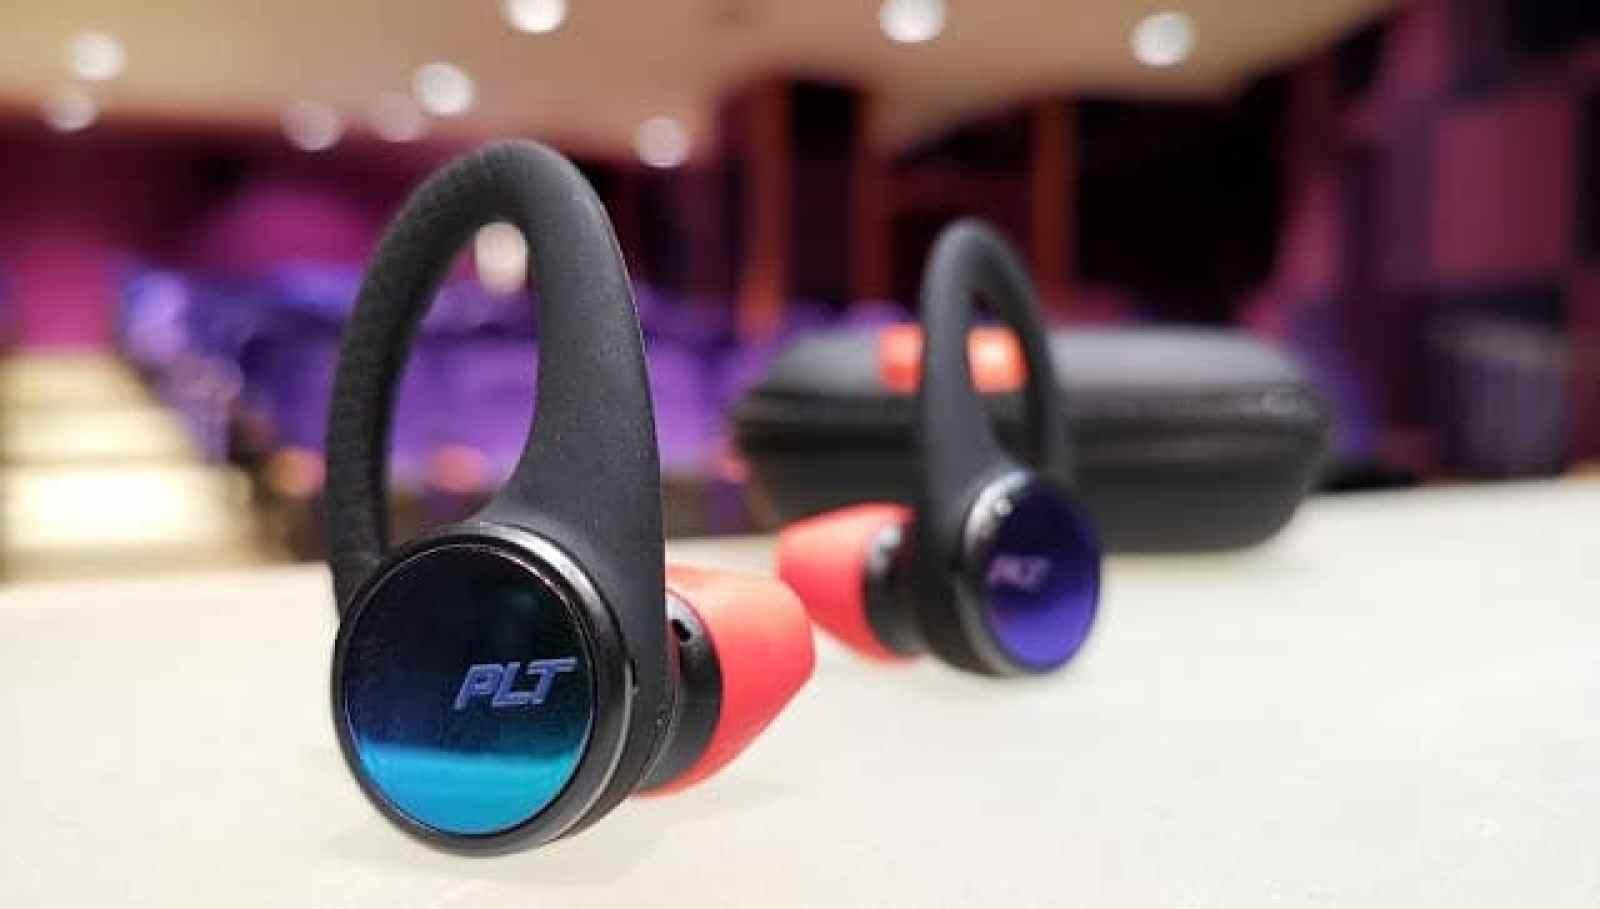 - IMG 20181106 111923 2 - รีวิว Plantronics BackBeat FIT 3100 หูฟังแบบ True Wireless Sport รุ่นแรกของค่าย